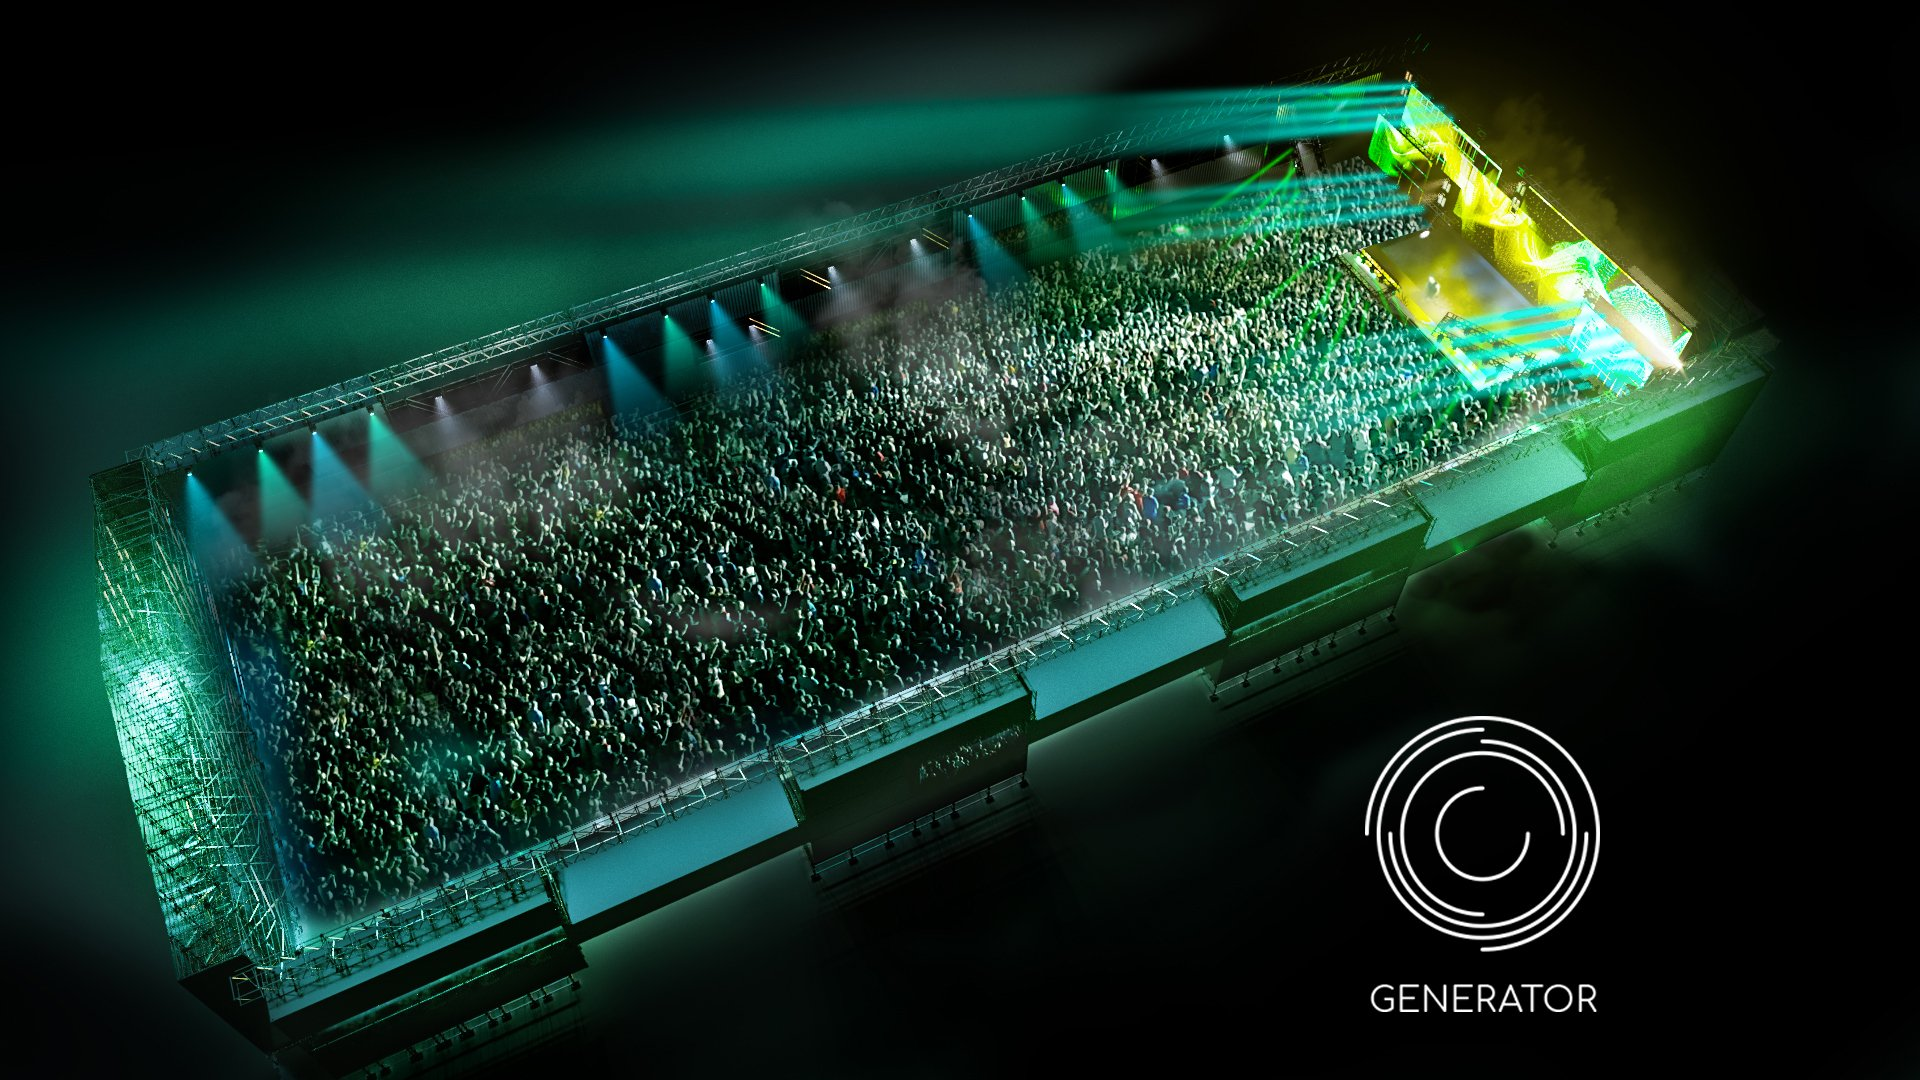 creamfields - generator